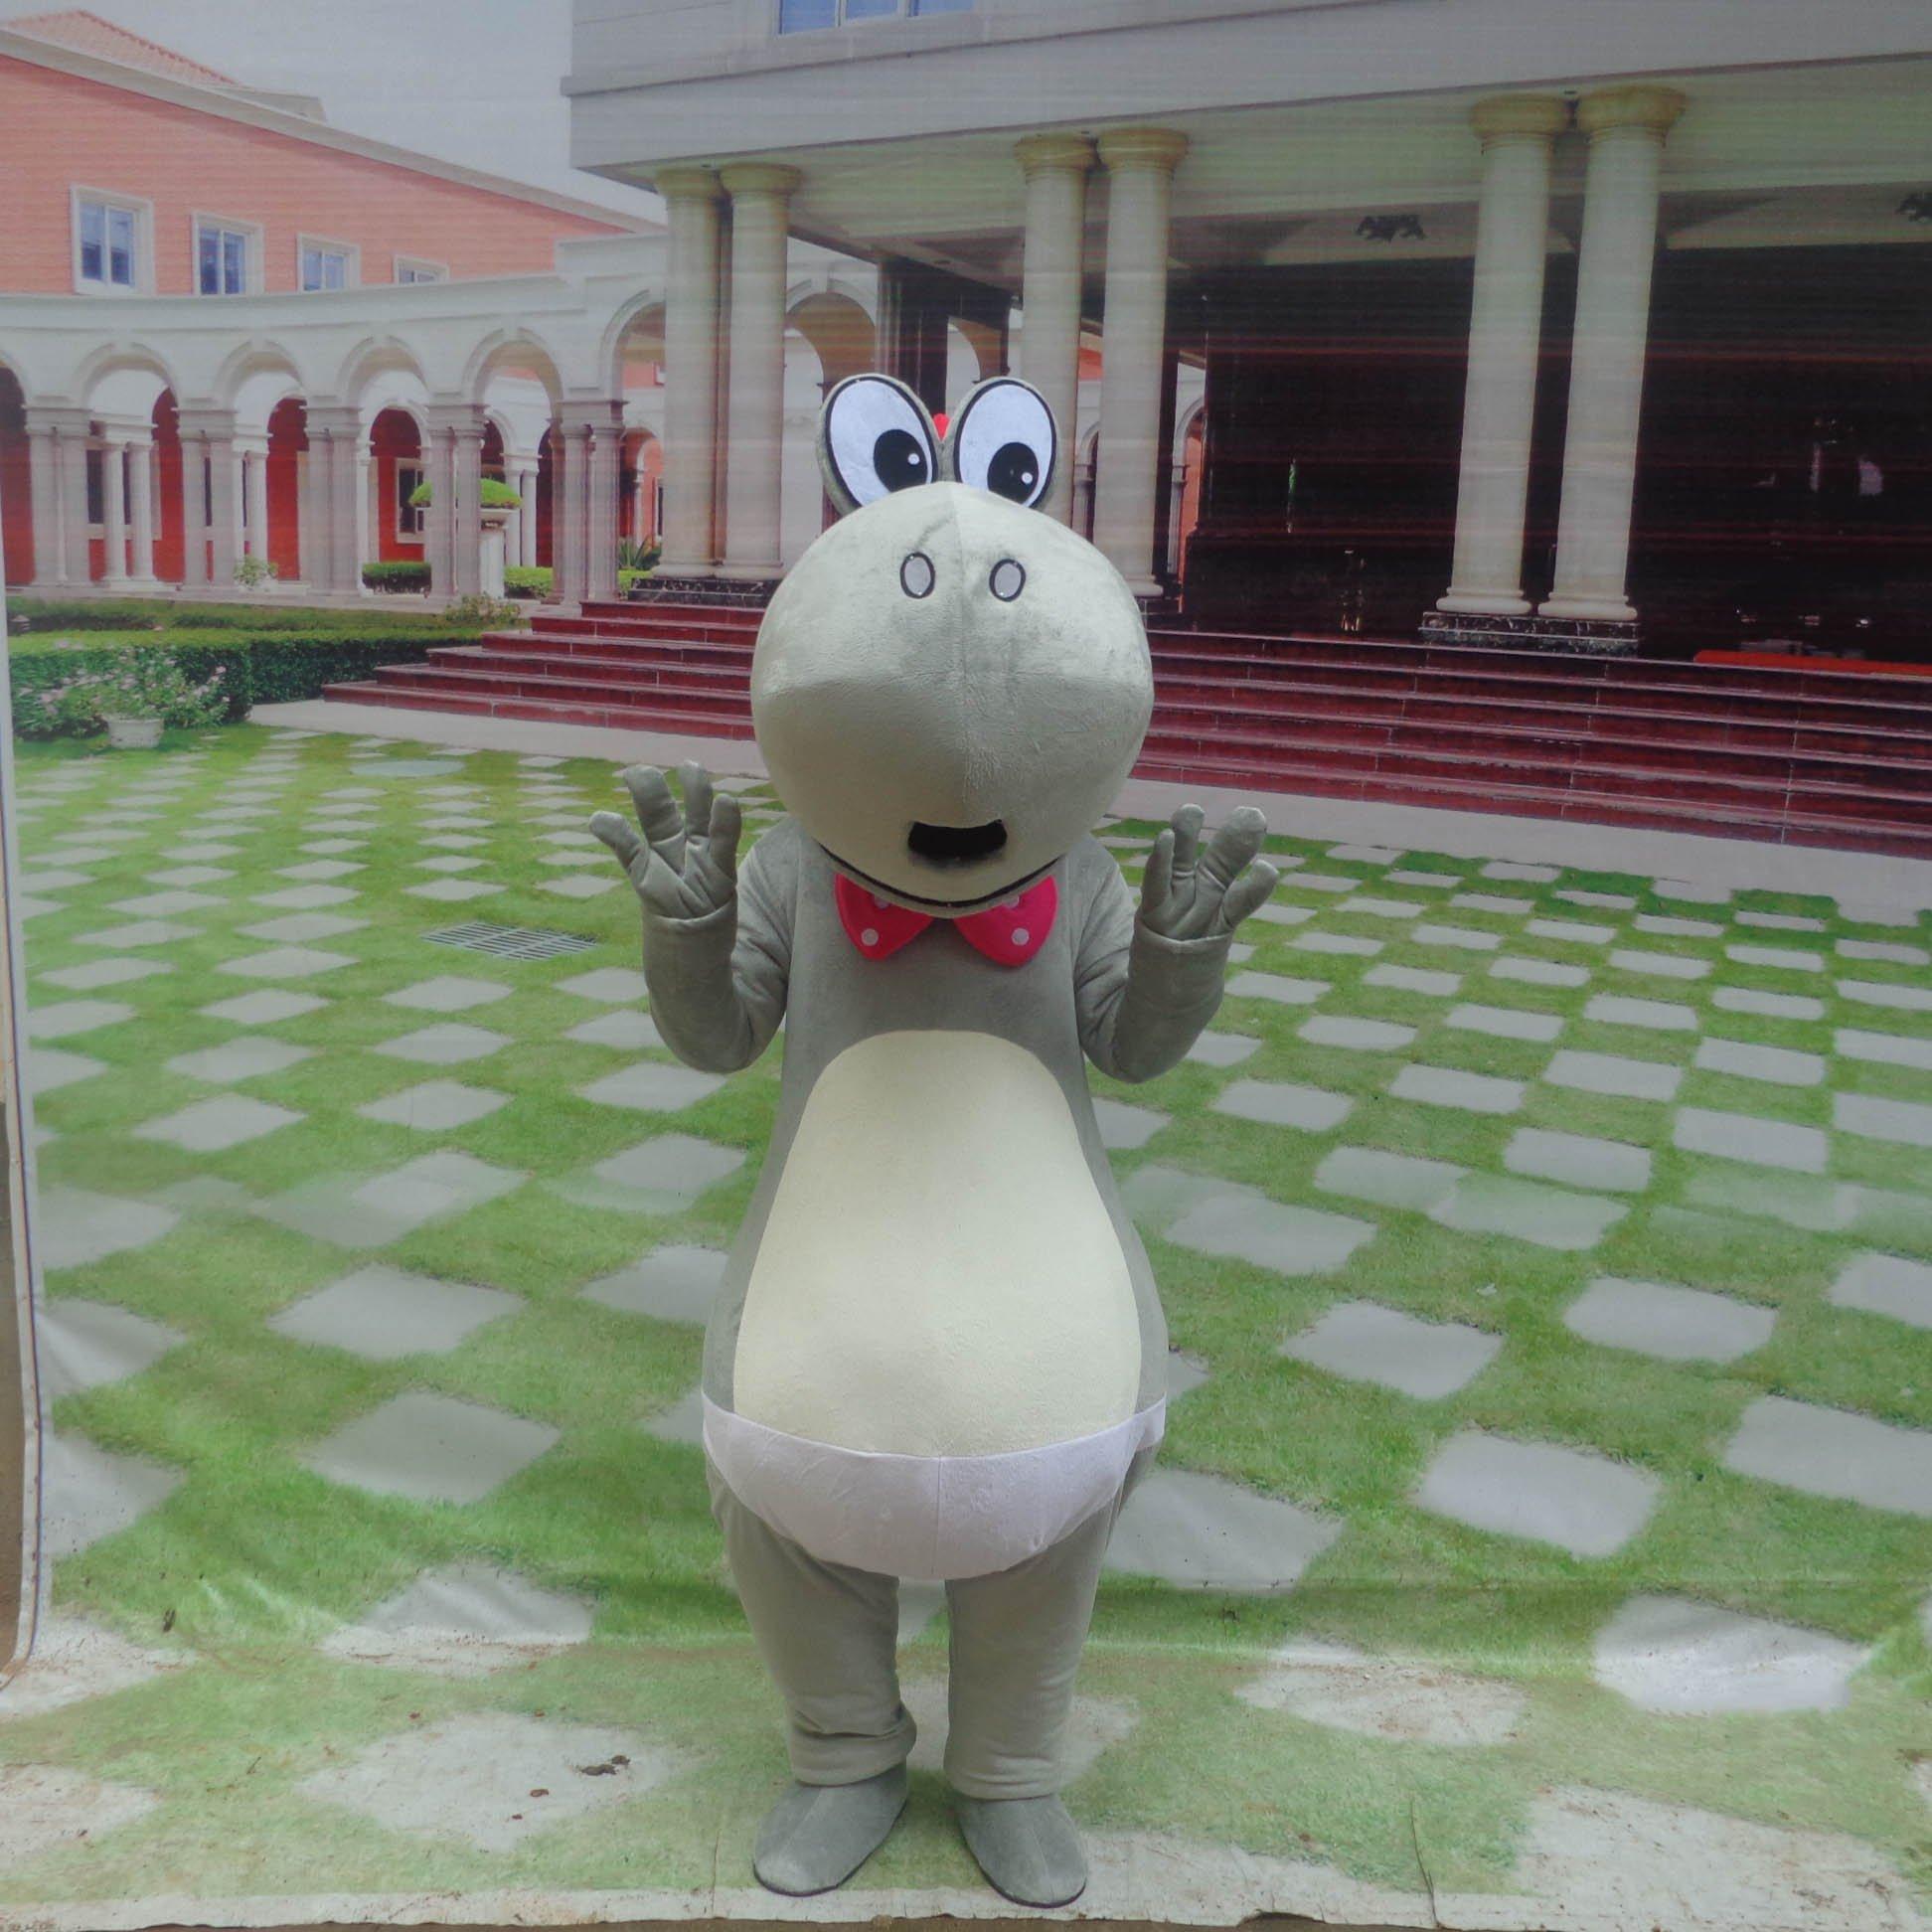 Cartoon Doll Clothing Cartoon Dragon Cartoon Walking Doll Clothing Cartoon Show Clothing Dragon Plush Doll Clothes Mascot Costume